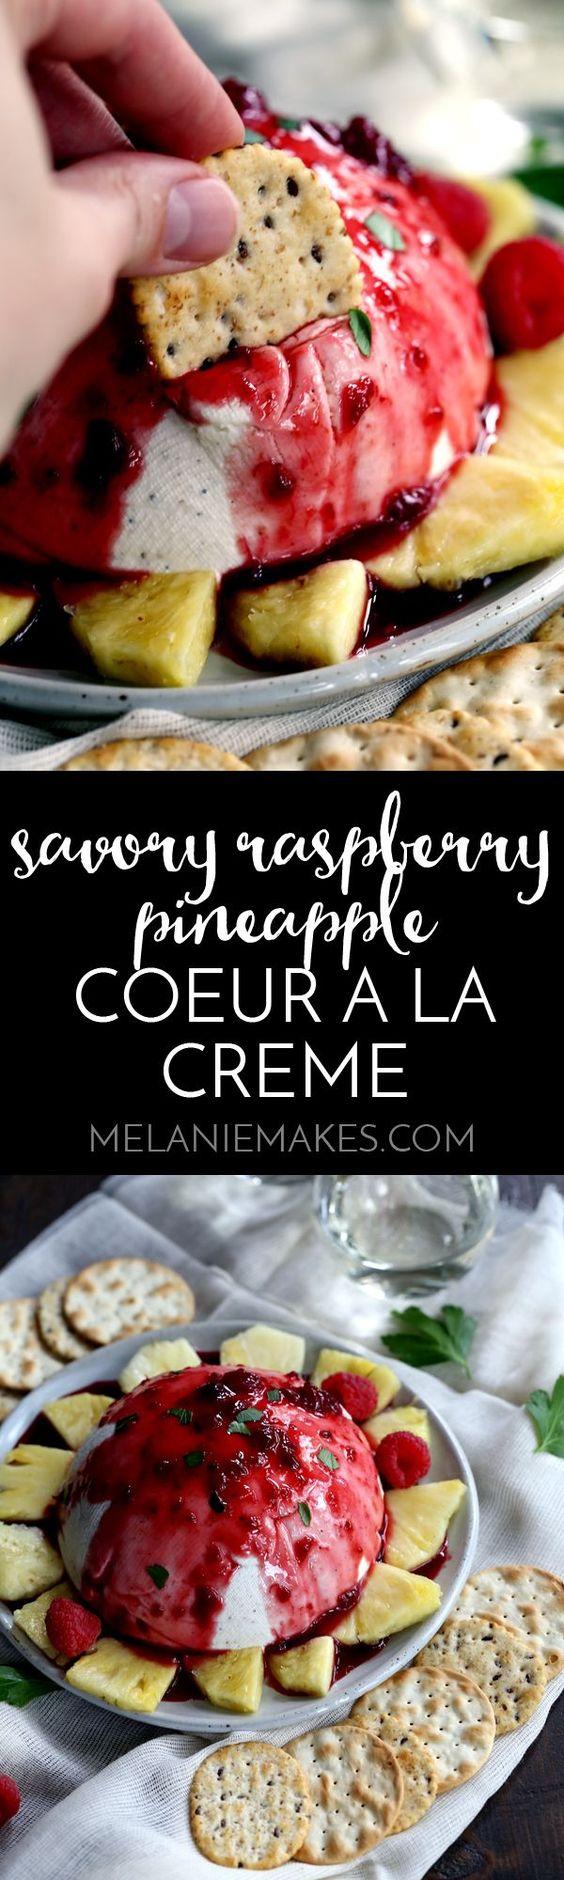 ... Pineapple Savory Coeur a la Creme | Recipe | Coeur D'alene